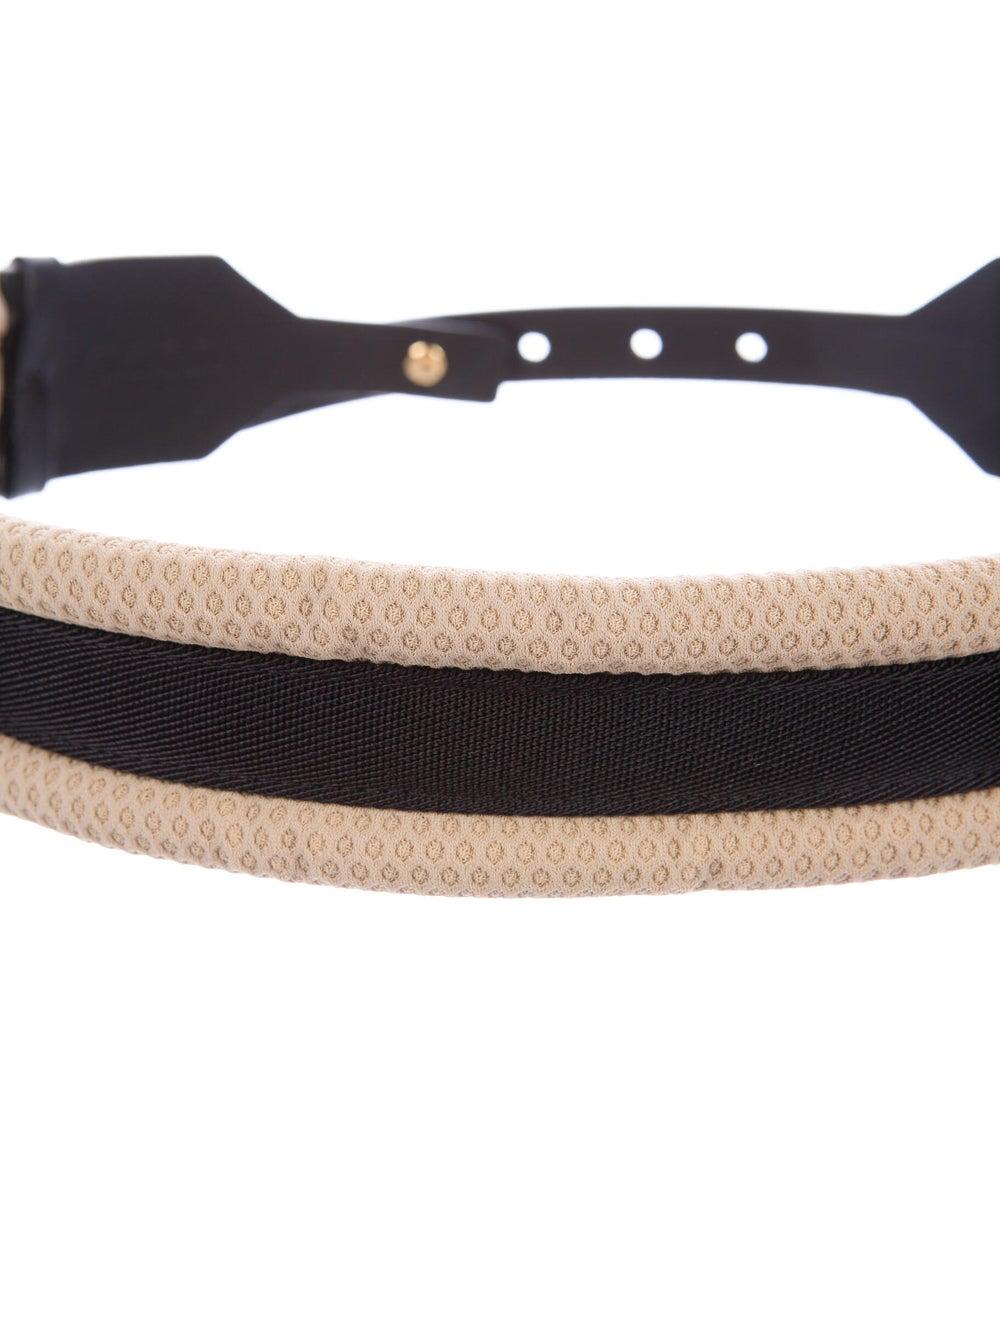 Marni Leather Wide Waist Belt Black - image 2